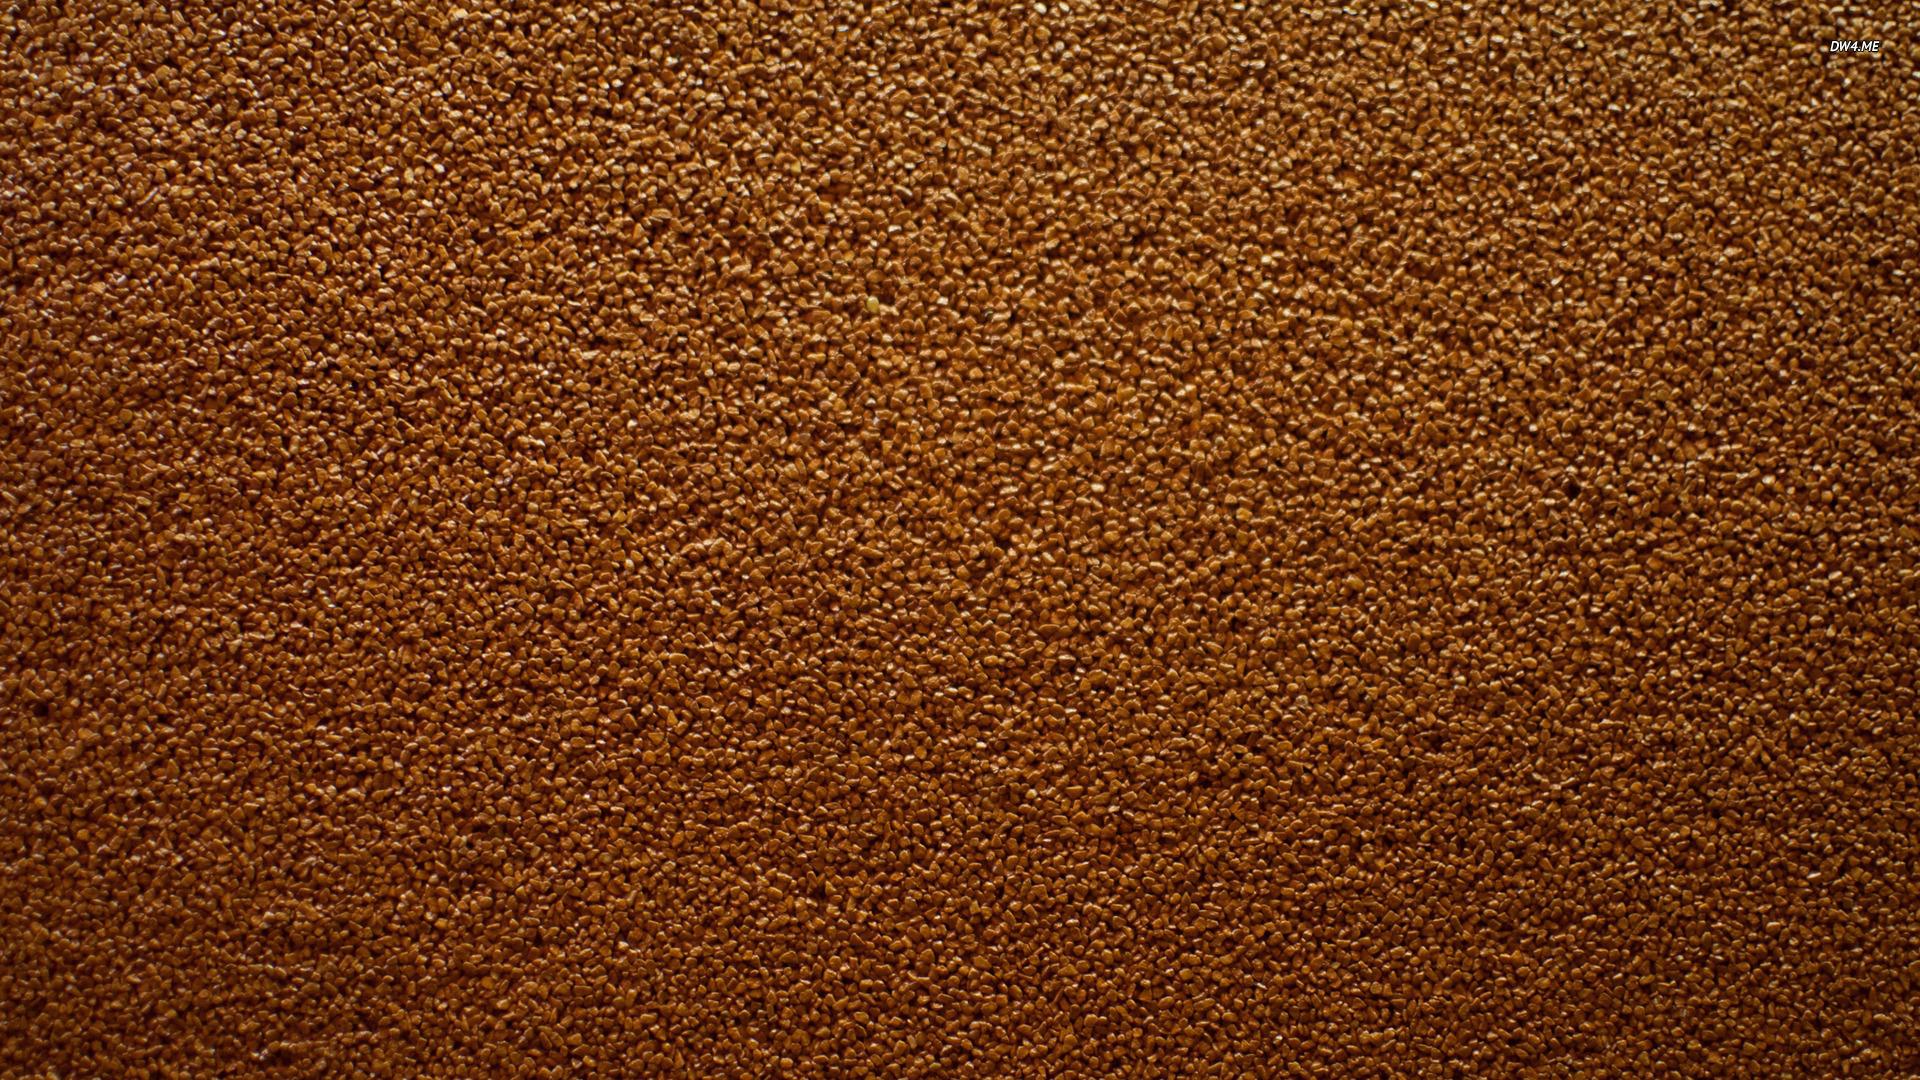 brown wallpaper for walls 2015   Grasscloth Wallpaper 1920x1080